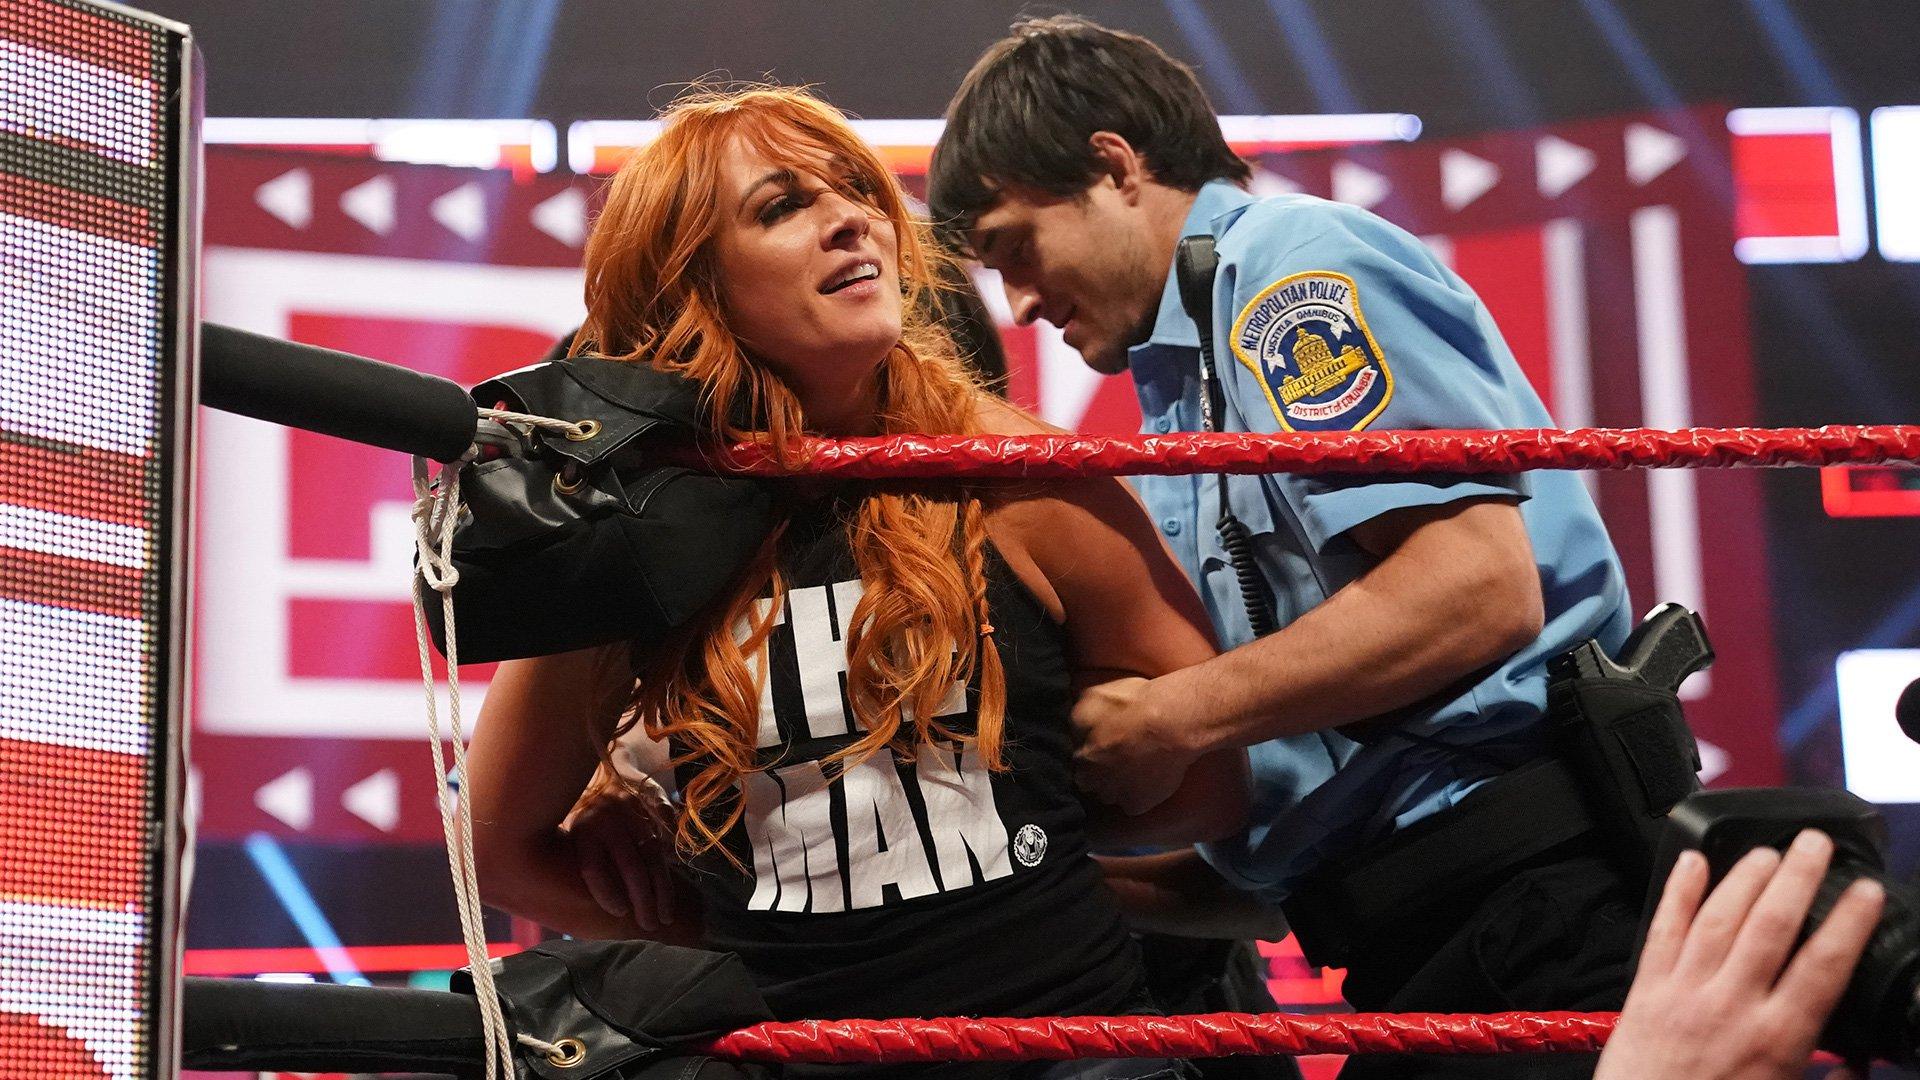 Top 10 des moments de Raw: WWE Top 10, 1er Avril 2019